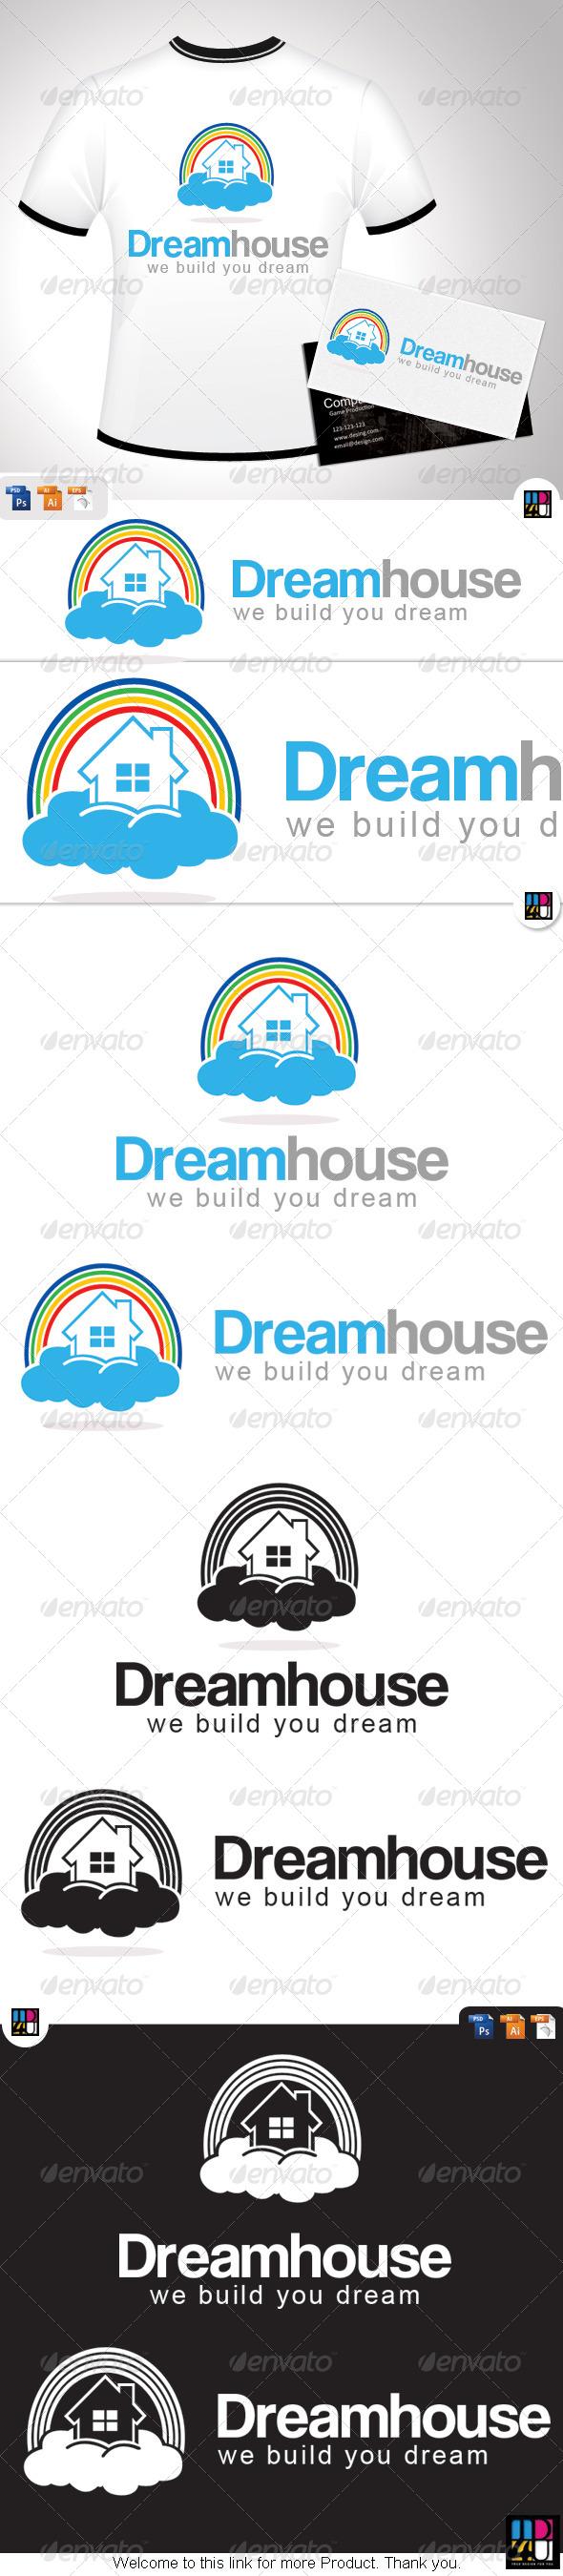 GraphicRiver Dream House We Build Your Dream 6218949